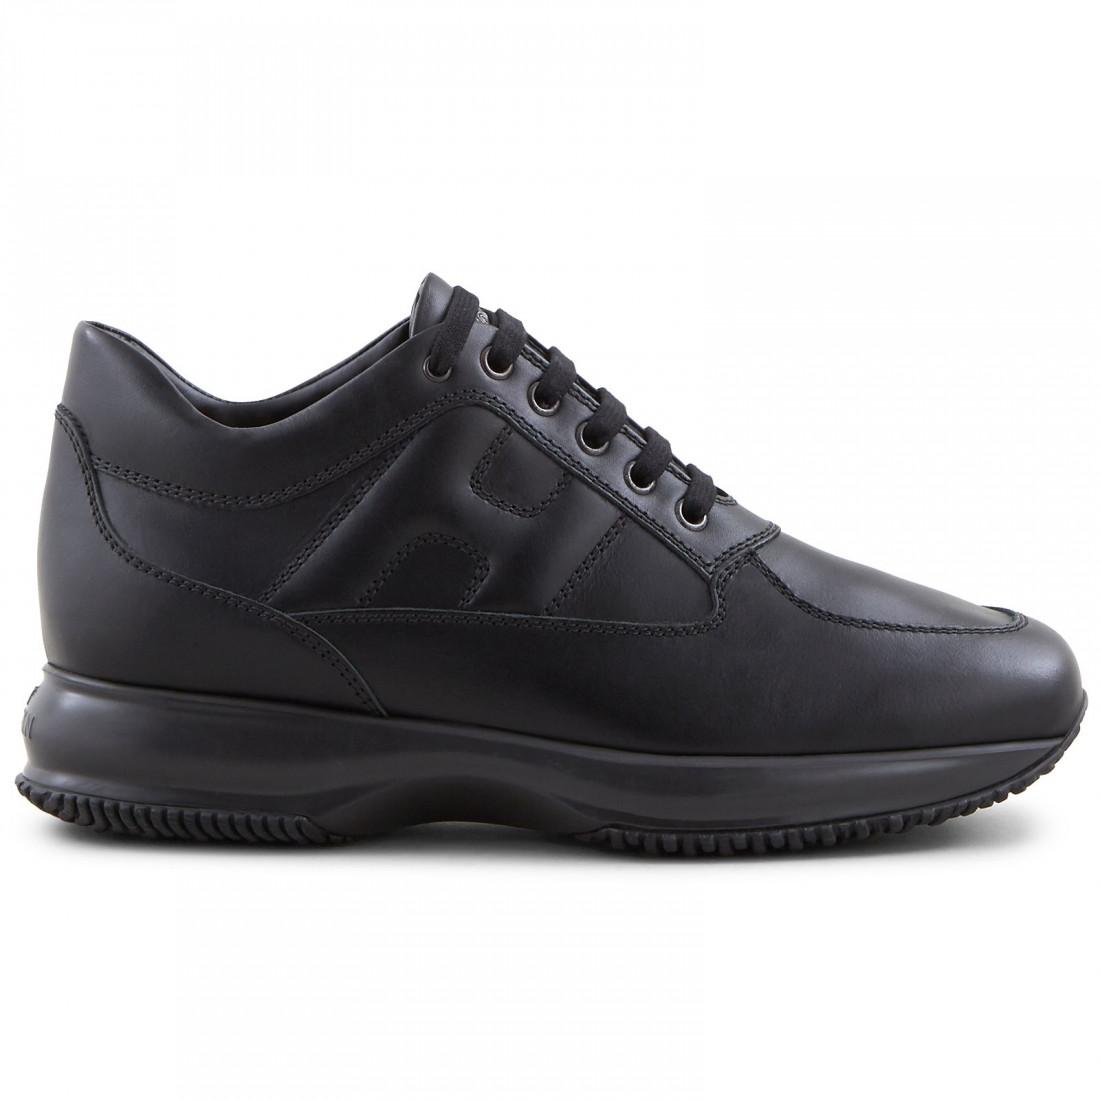 Men's Hogan Interactive sneakers in black leather